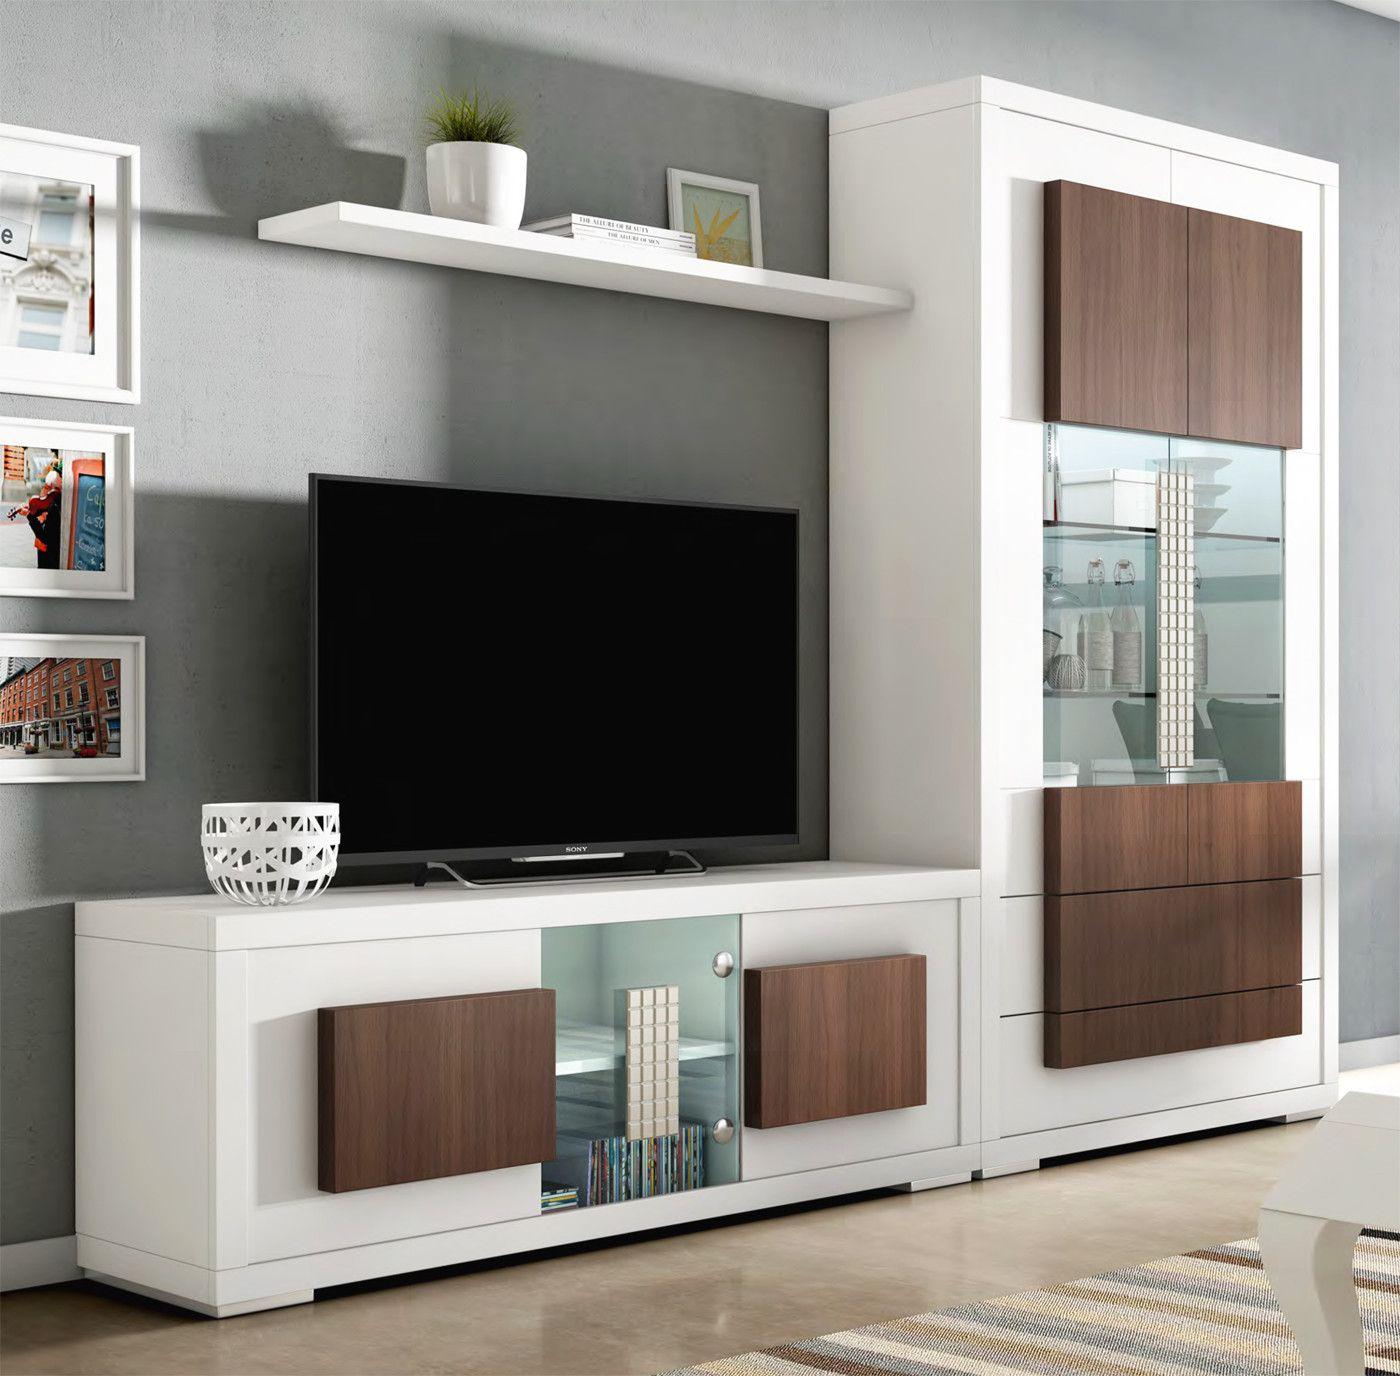 Muebles de sal n de dise o con vitrina y mesa tv madera en for Diseno de muebles para tv modernos